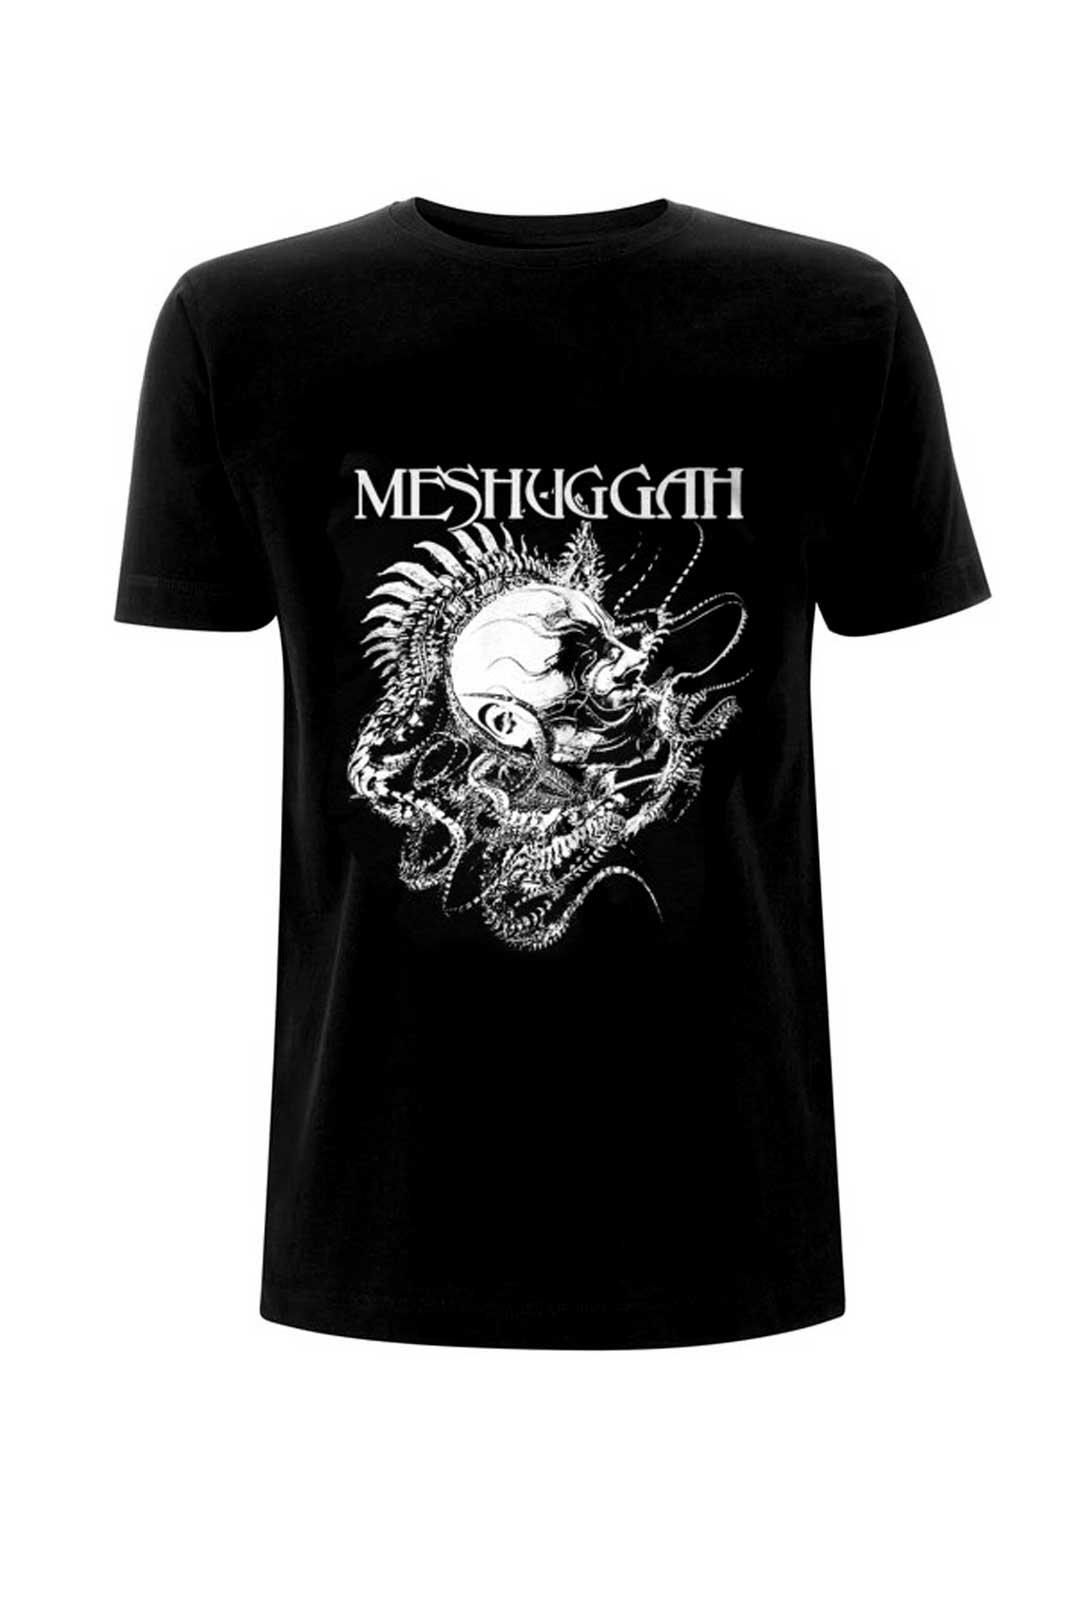 Meshuggah Spine Head Tee Front